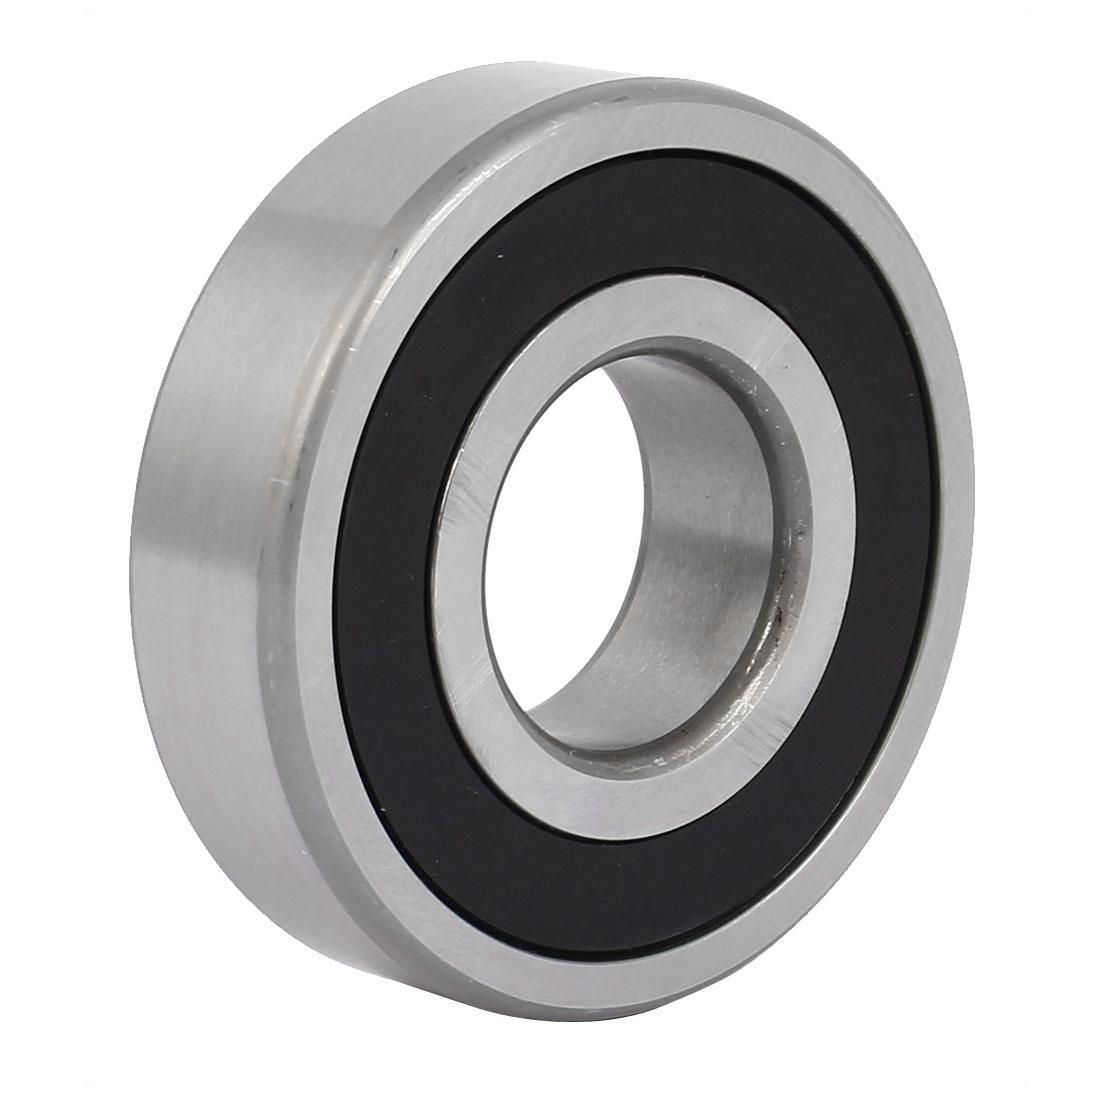 RZ6306 Double Shielded Deep Groove Ball Bearing 72mmx30mmx19mm